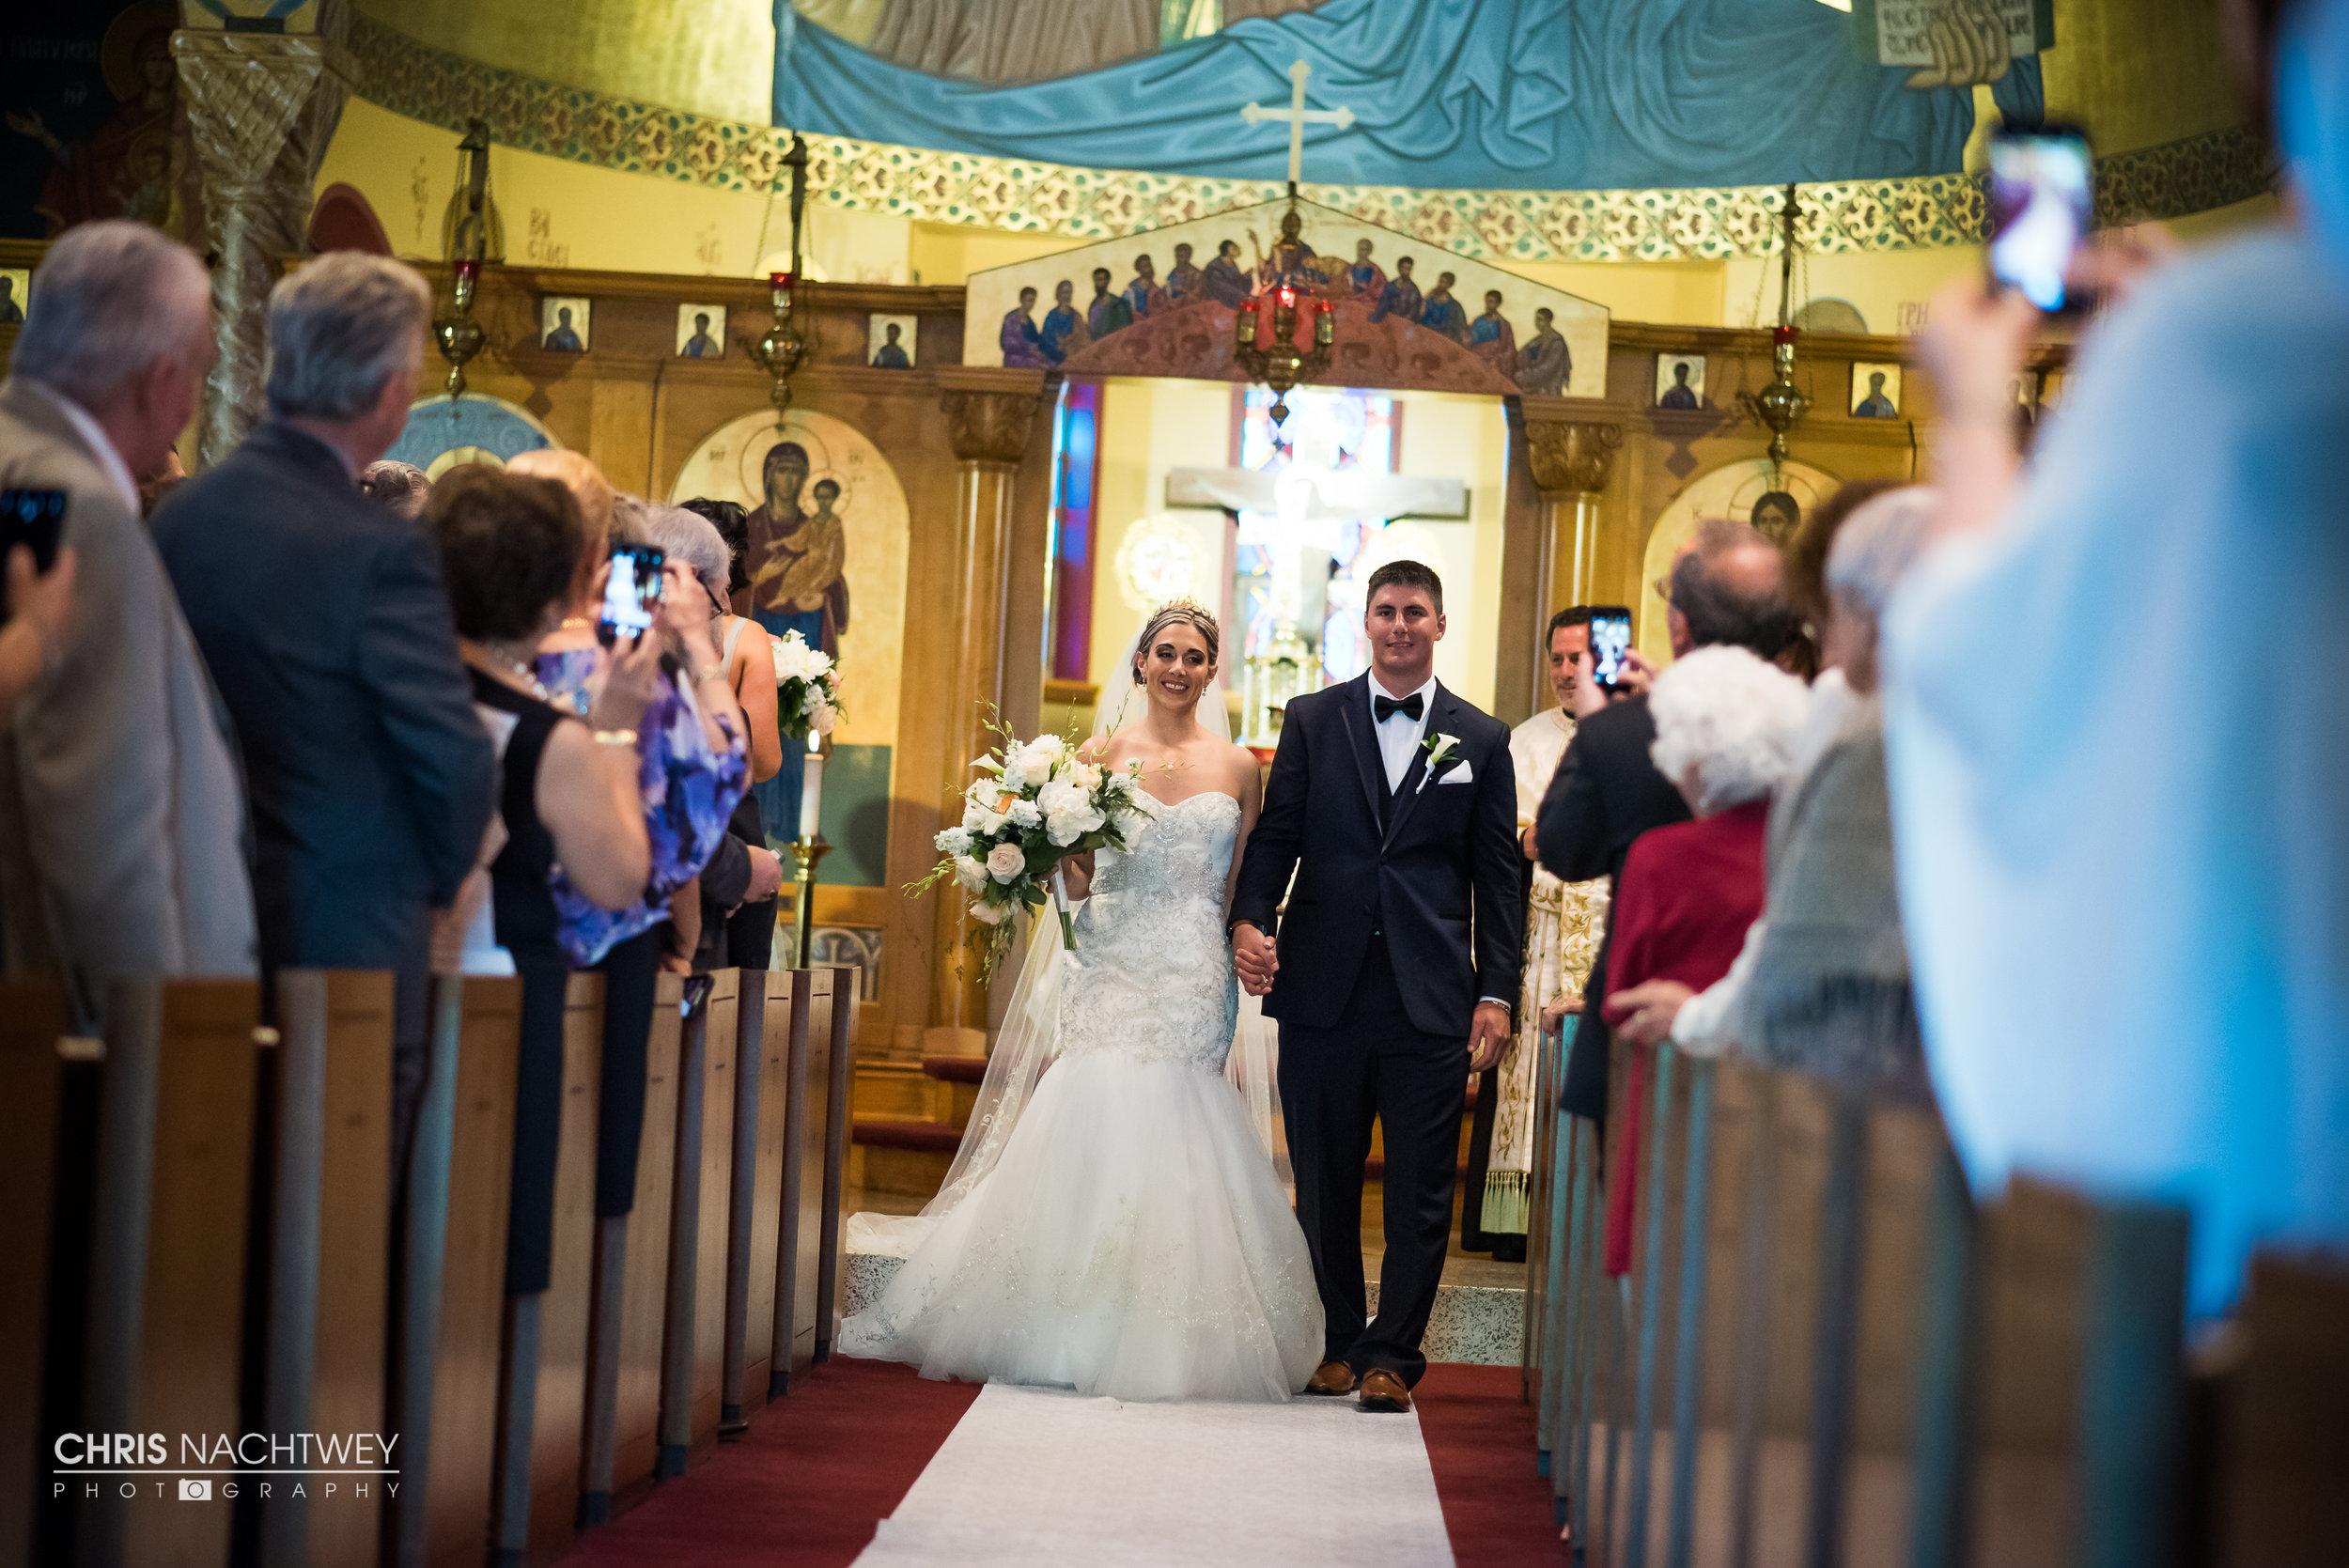 mystic-artistic-wedding-photographer-chris-nachtwey-2017-14.jpg